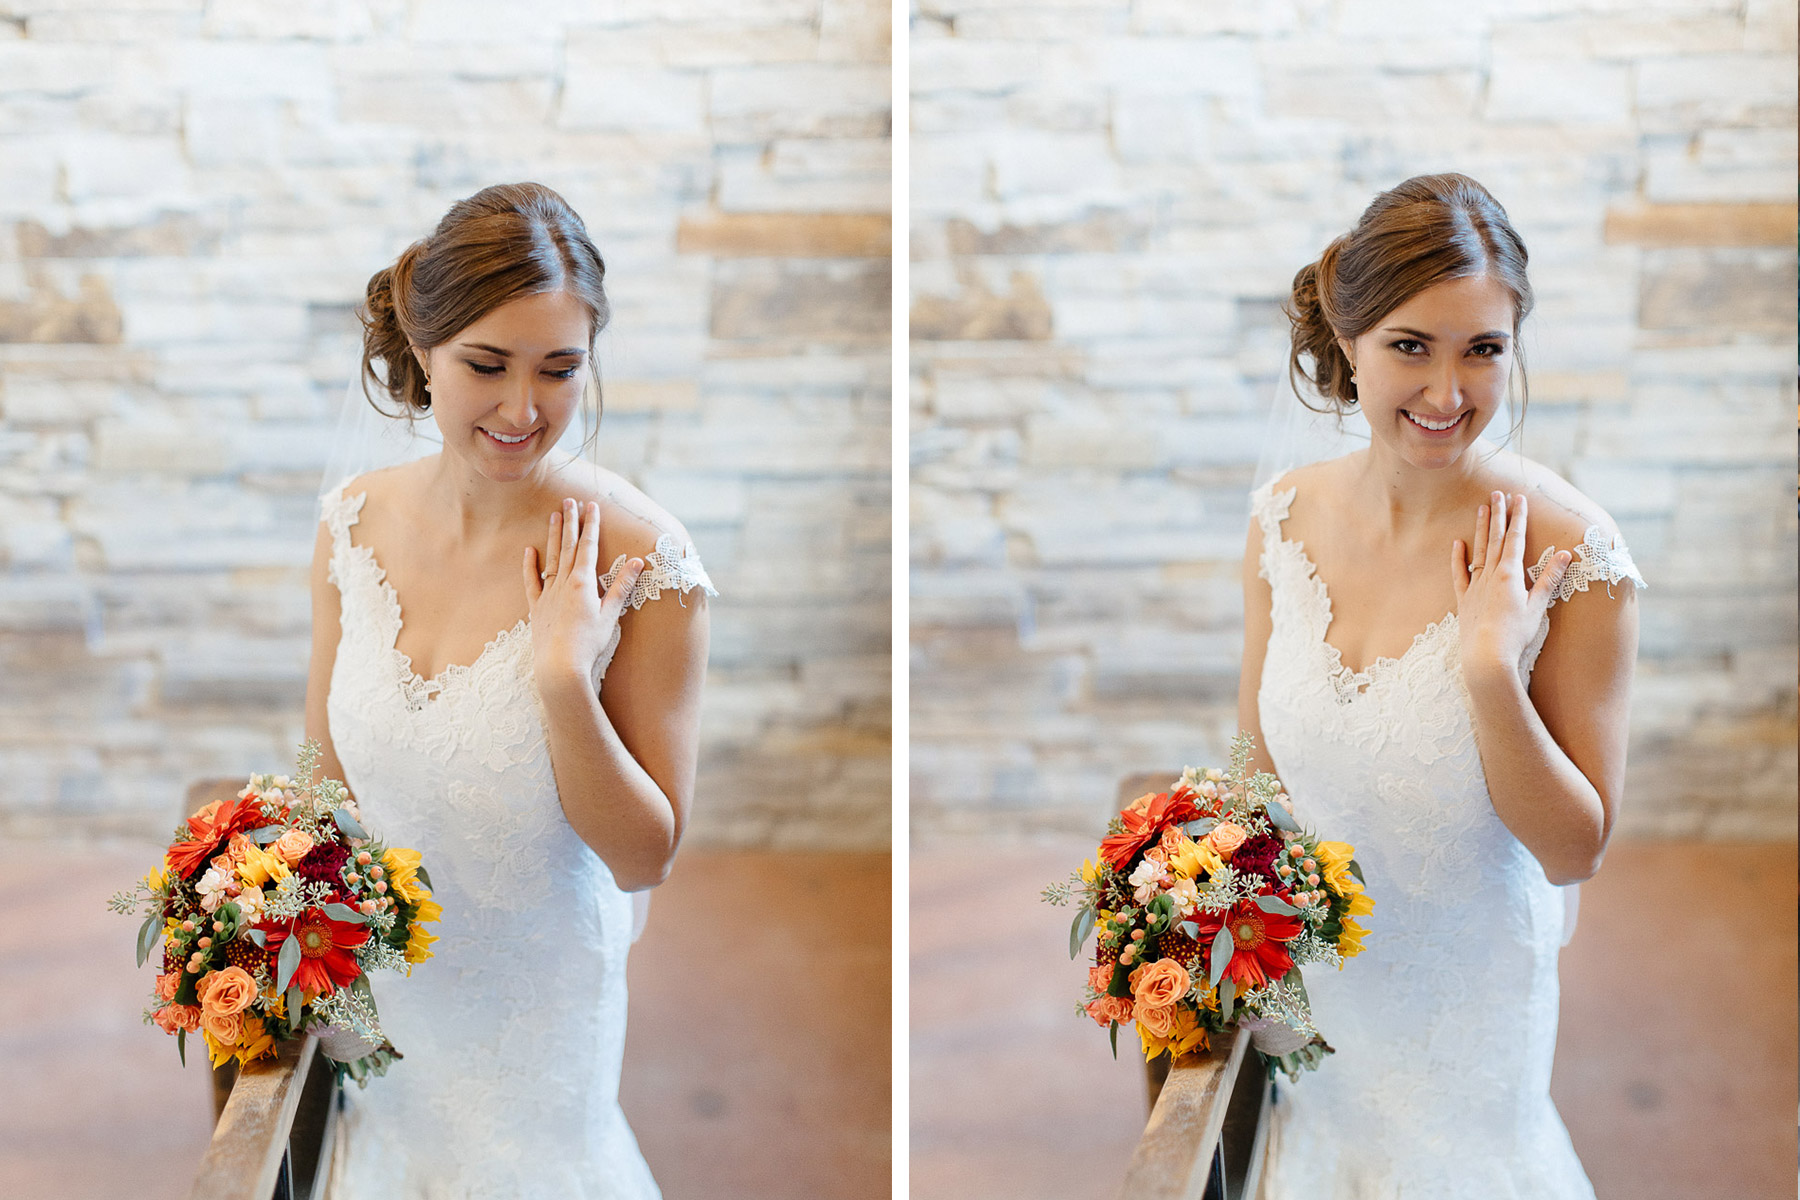 160902-Luxium-Weddings-Arizona-Michael-Becca-Spruce-Mountain-Ranch-Colorado-webres-029a.jpg